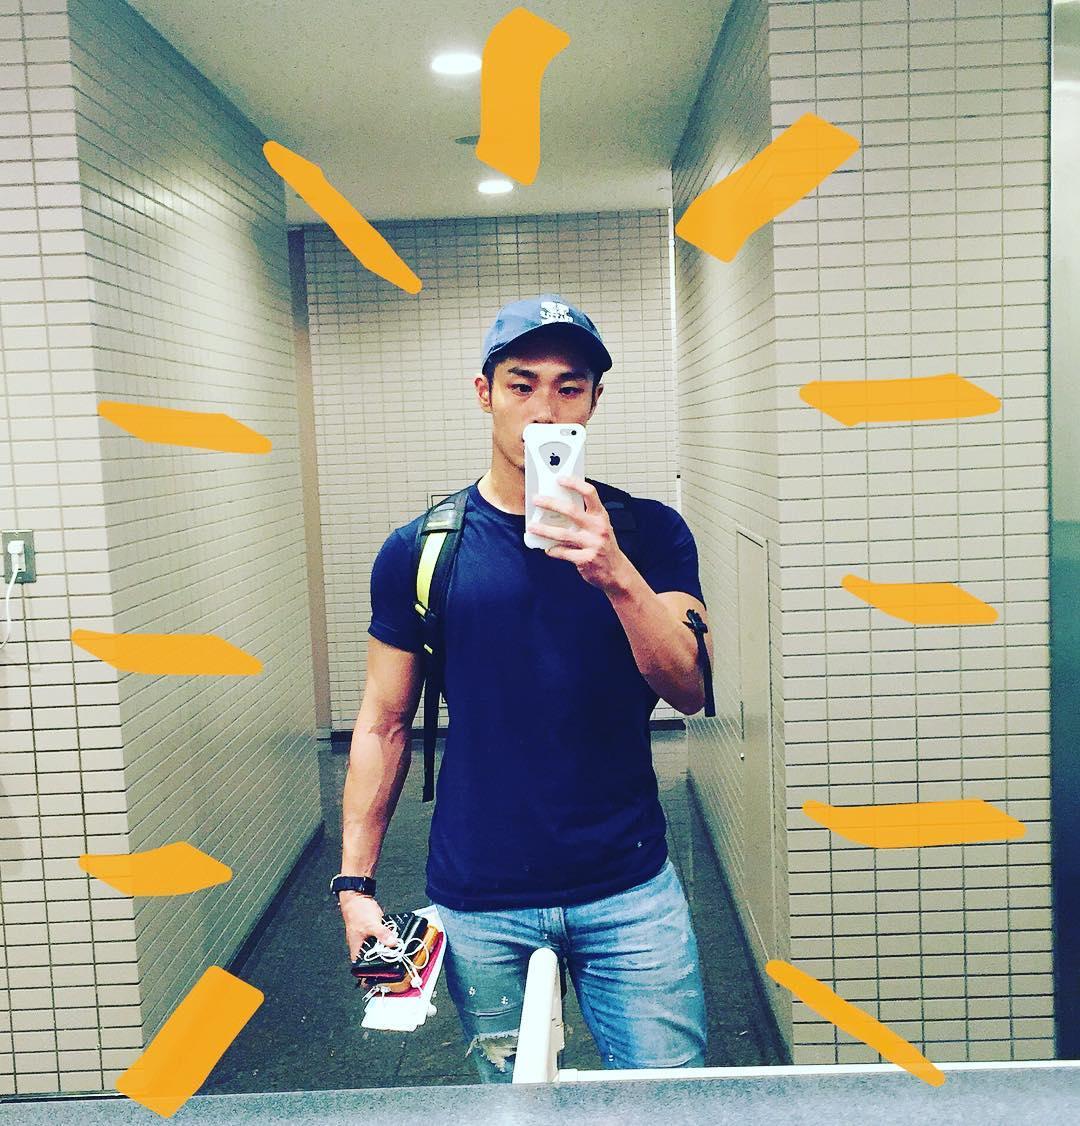 Gay Nightlife Tips by Shin from Tokyo Japan